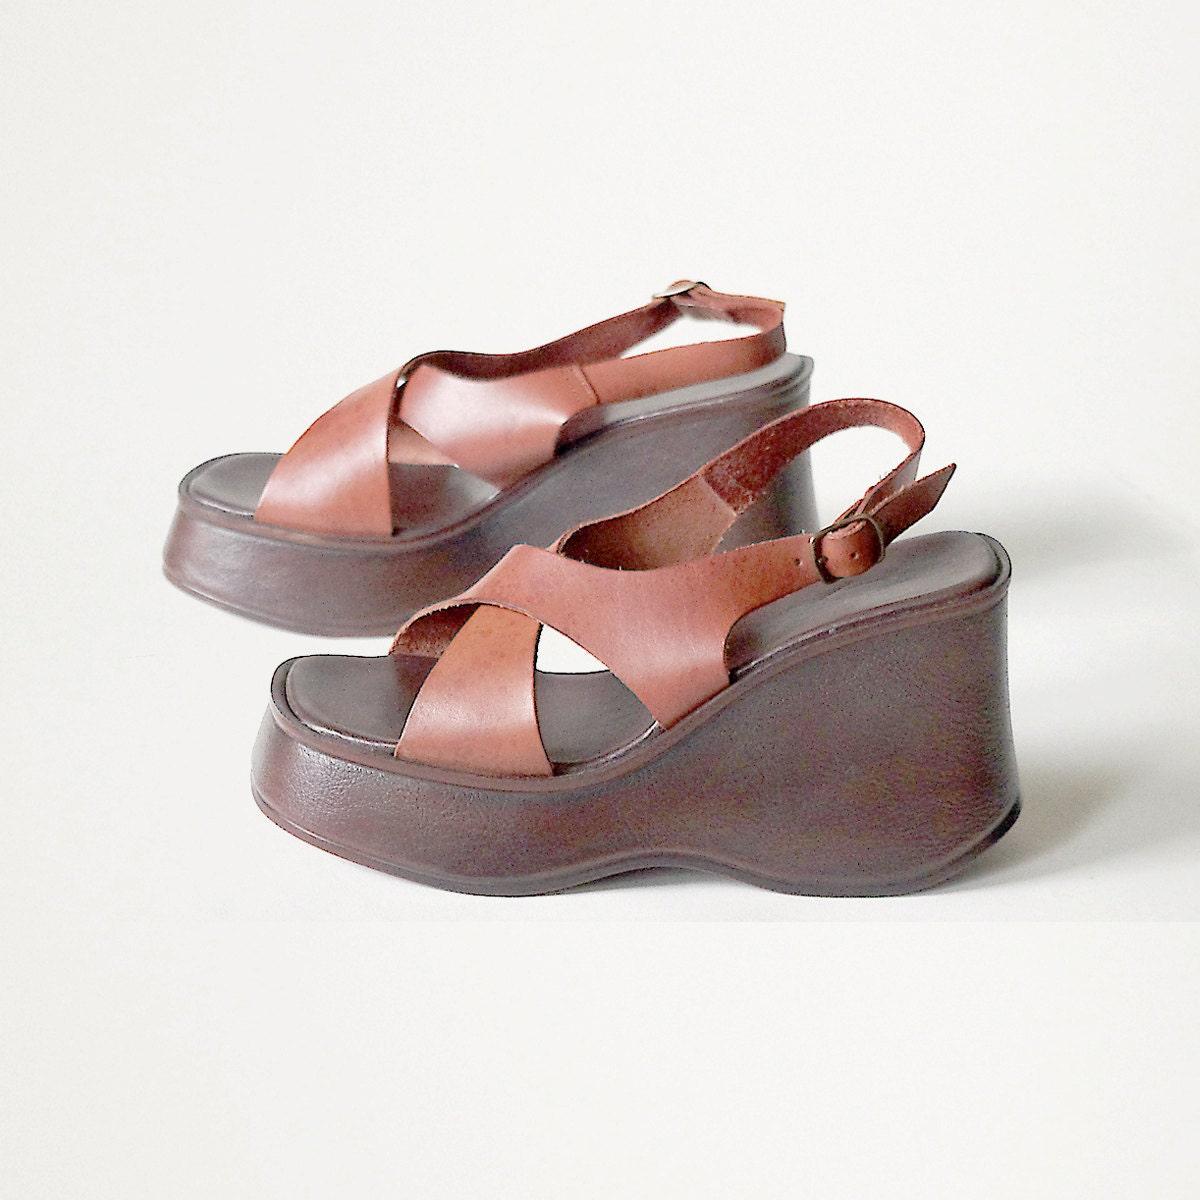 vintage platform sandals womens shoes 8 by cherryzovintage